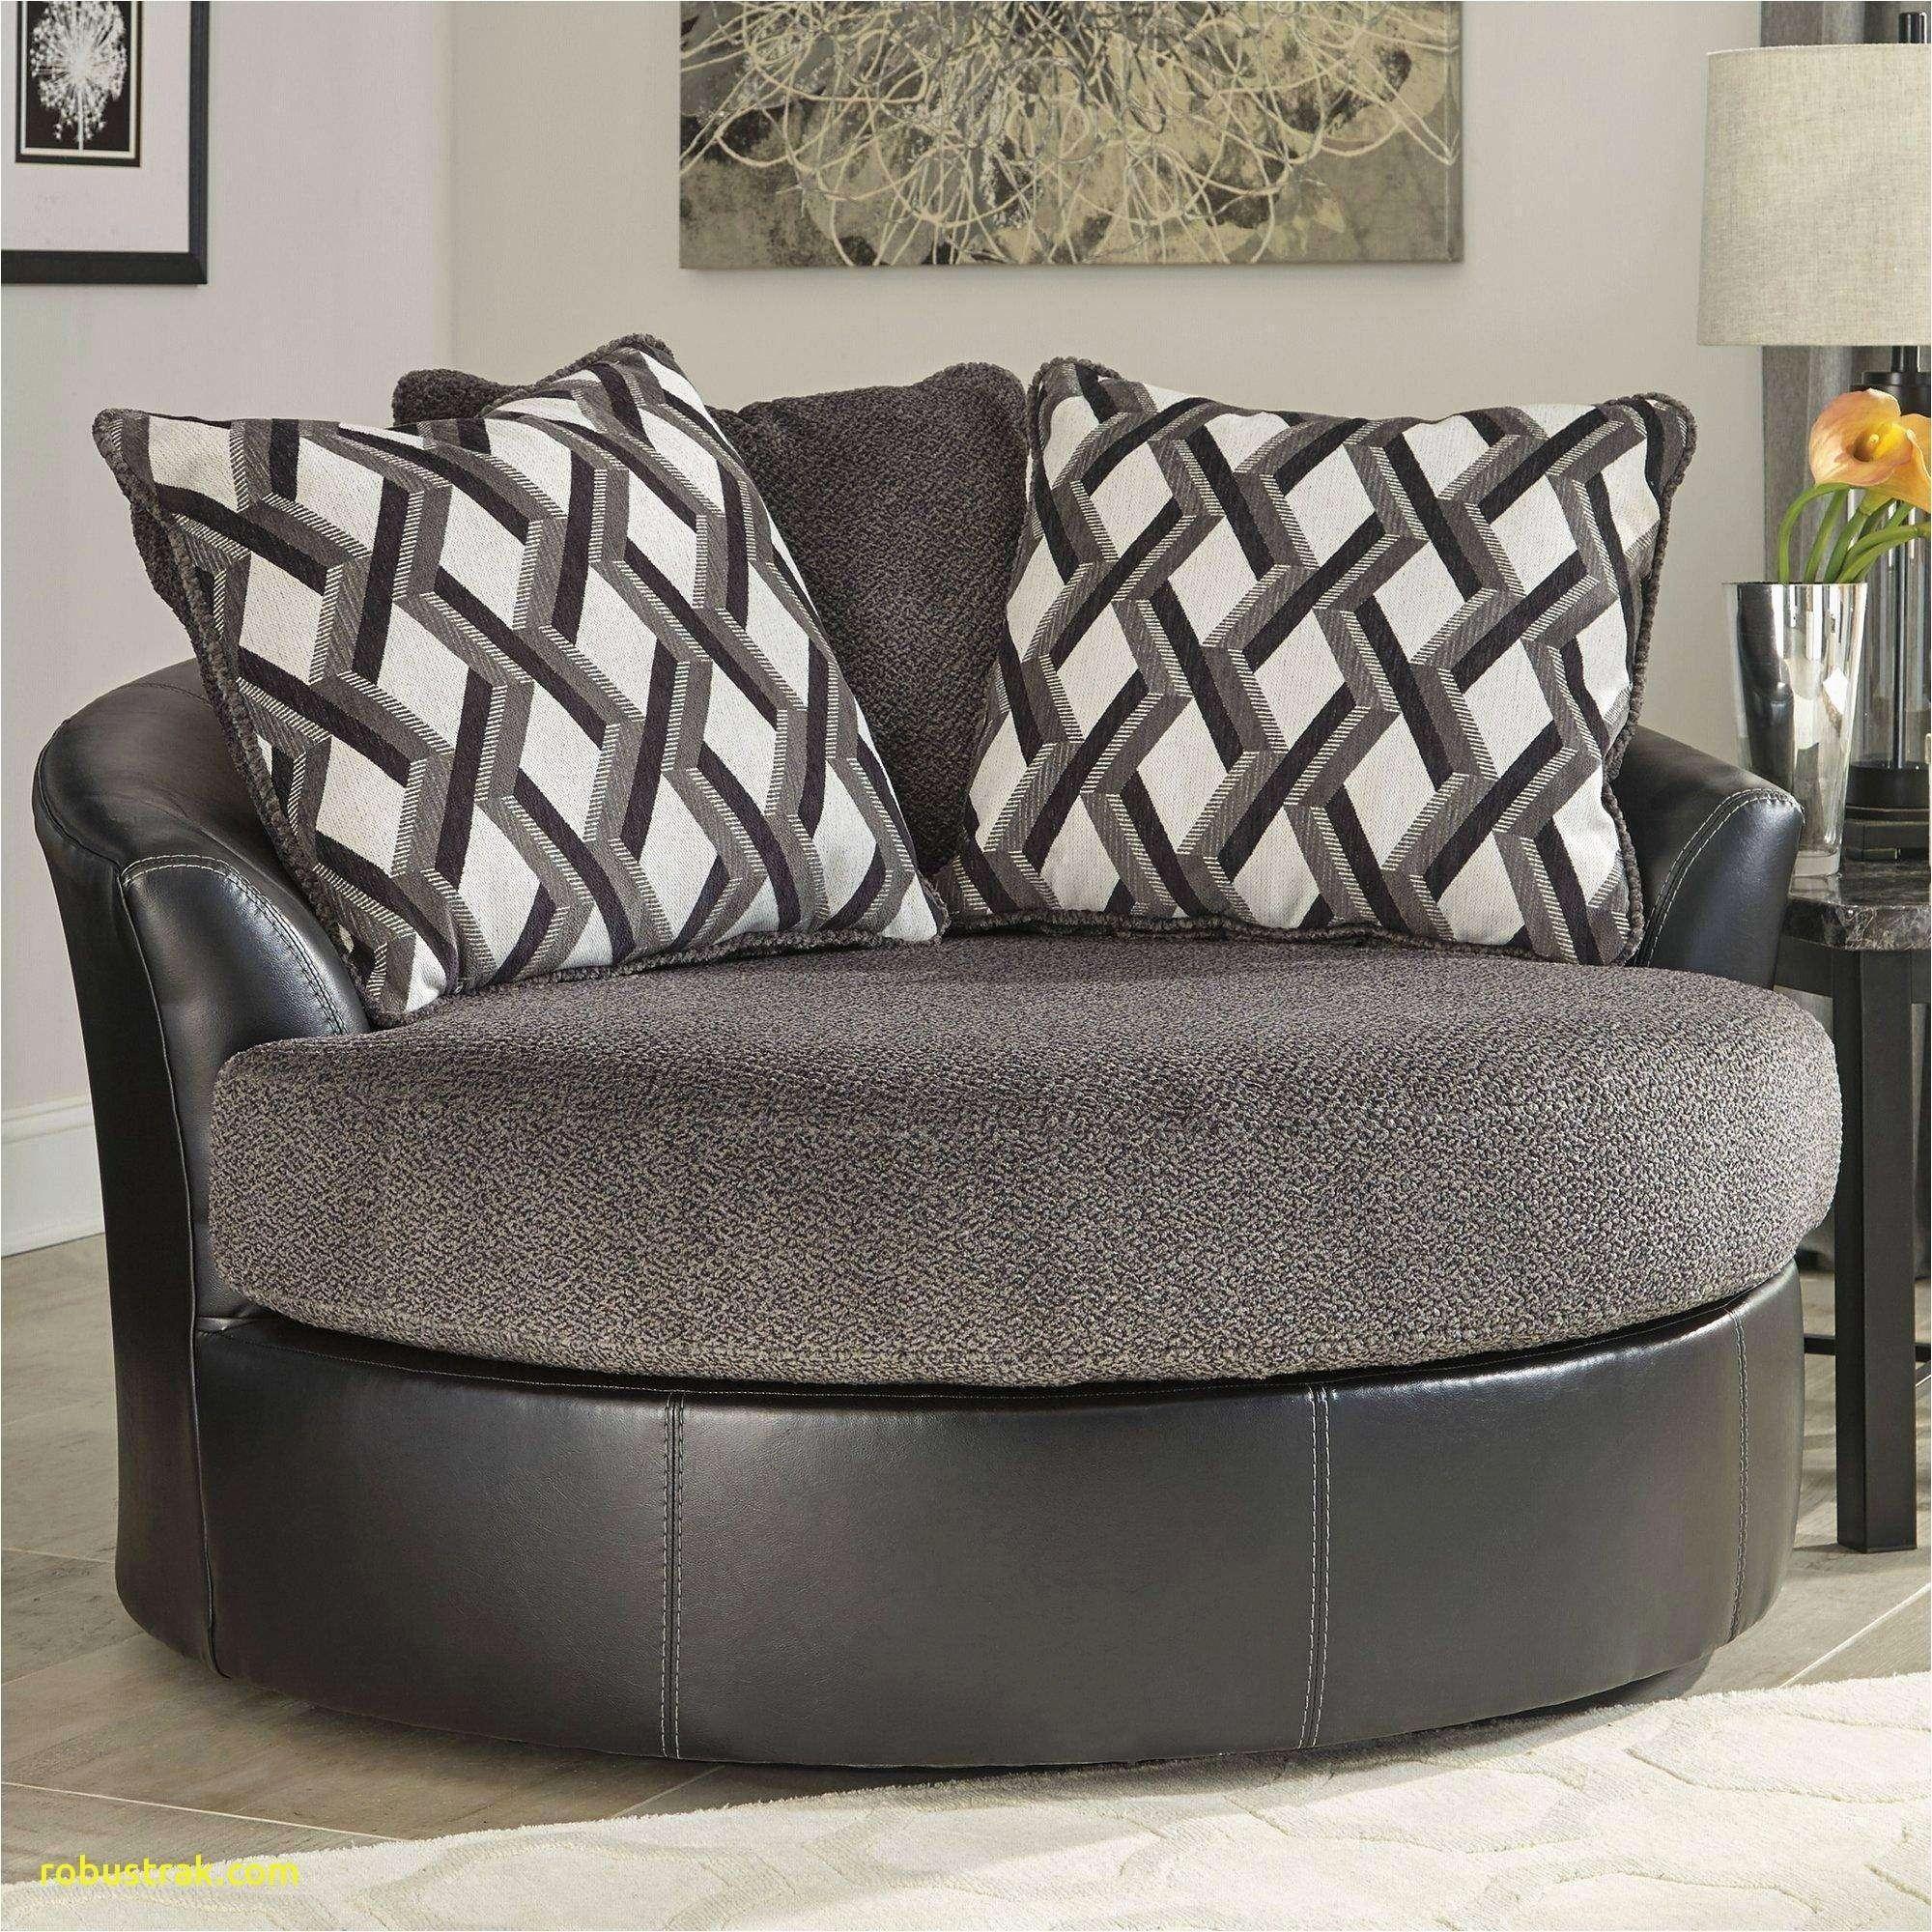 Beautiful Conforama Chaise De Salle A Manger Sofa Swivel Barrel Chair Iron Patio Furniture